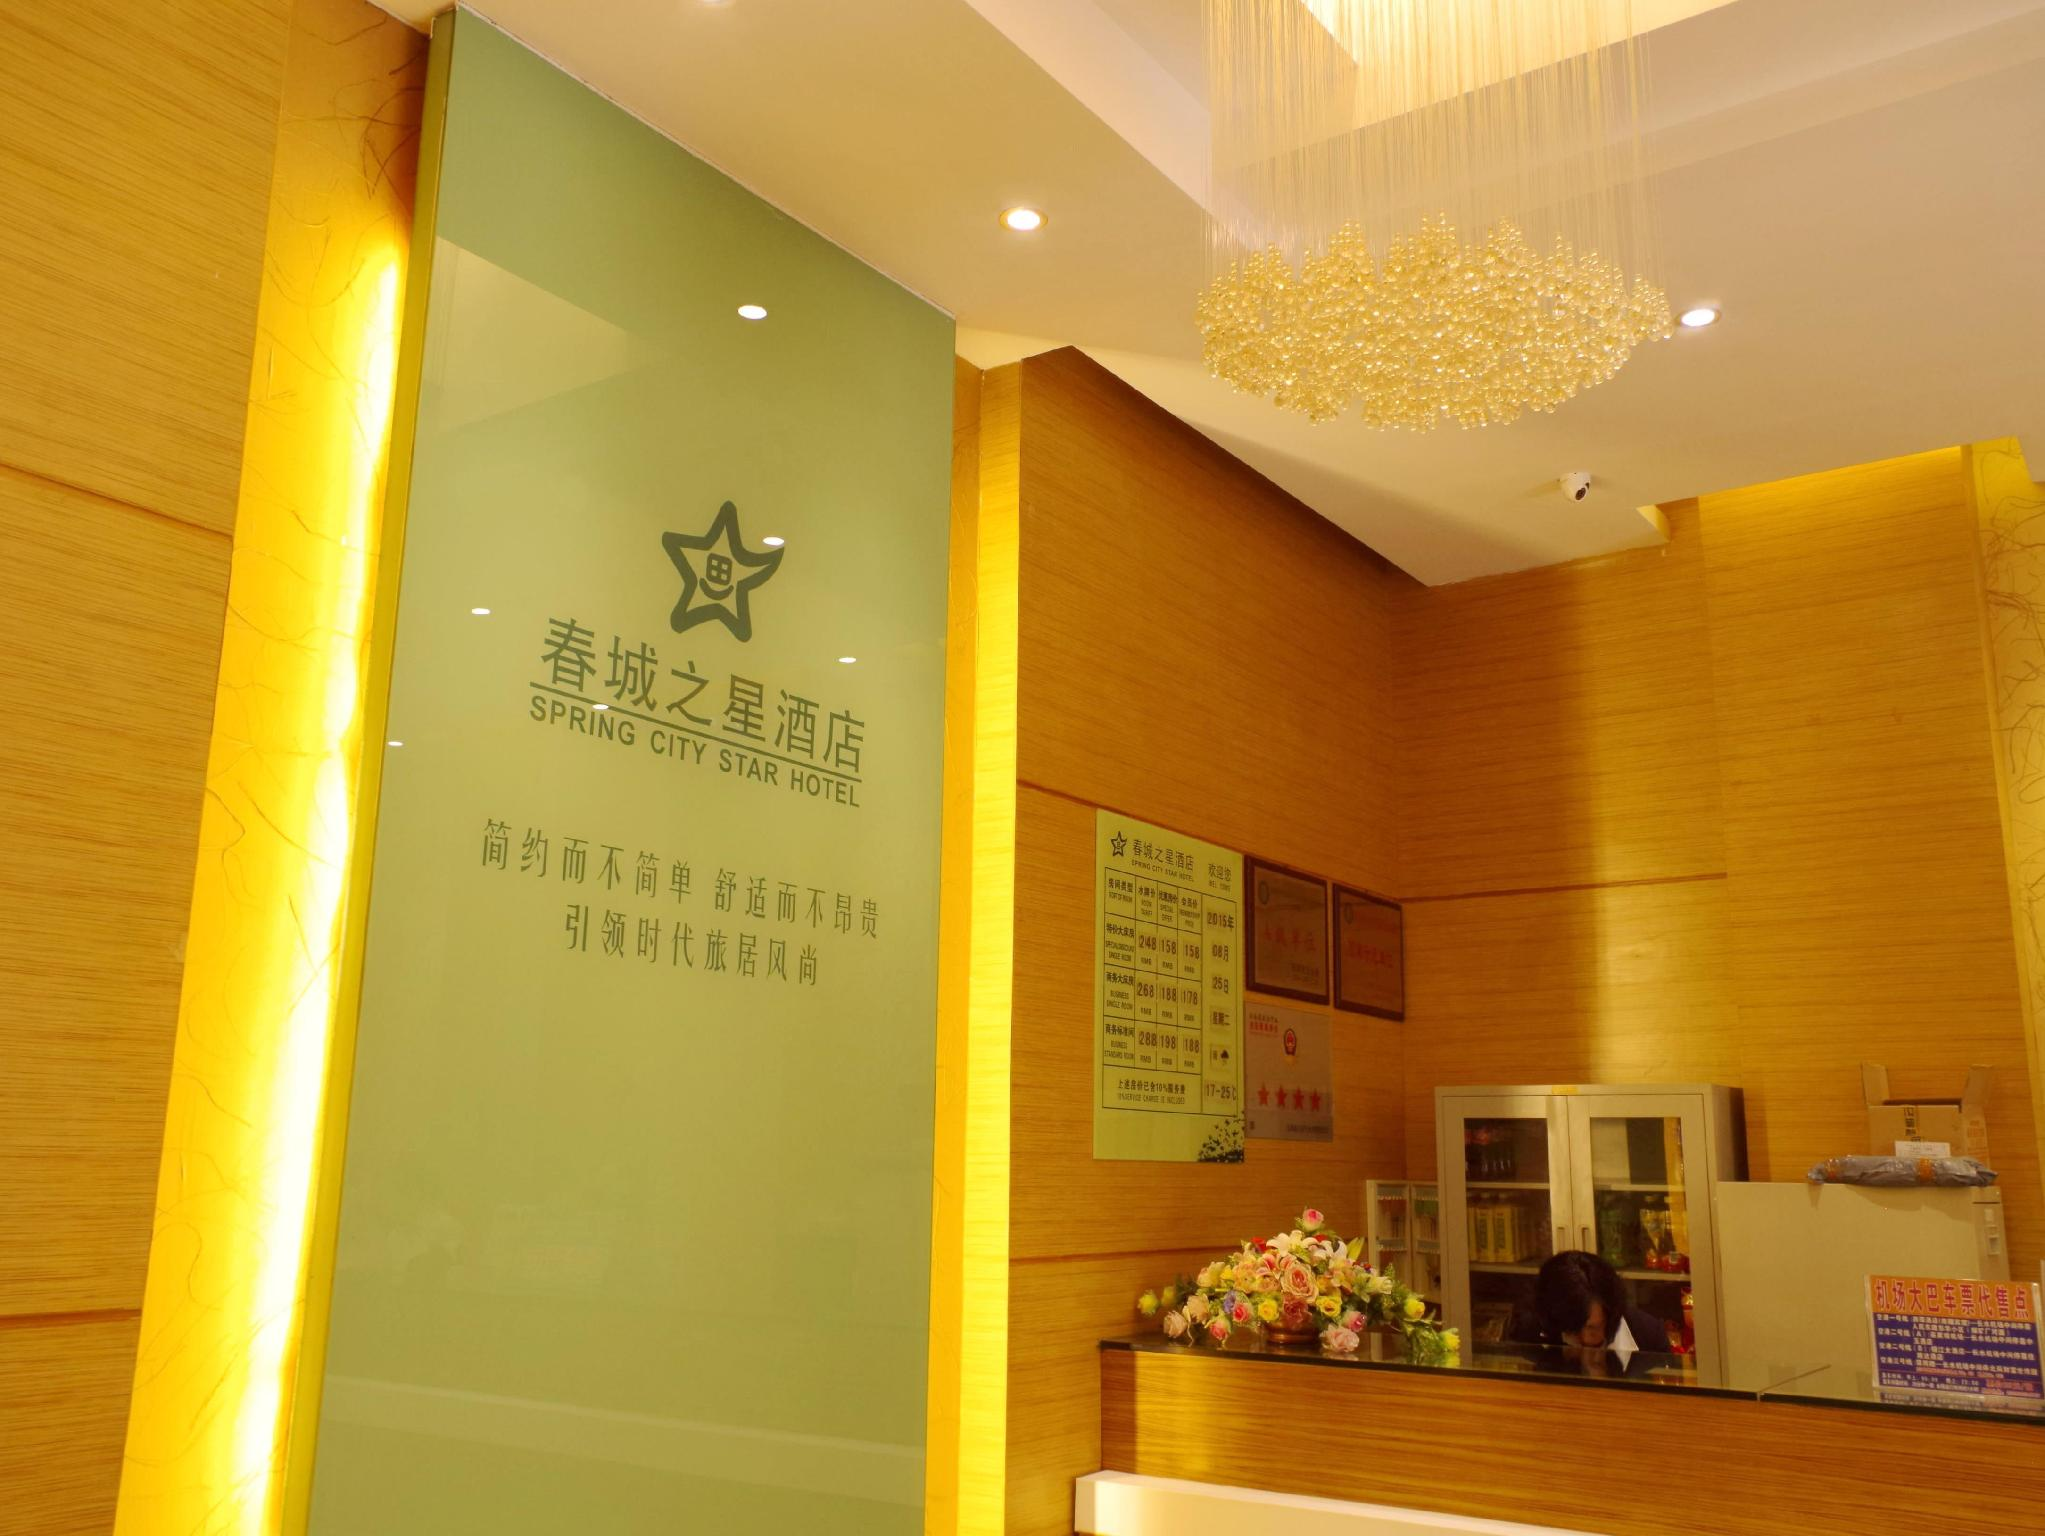 Spring City Star Hotel Jifeng Branch, Kunming